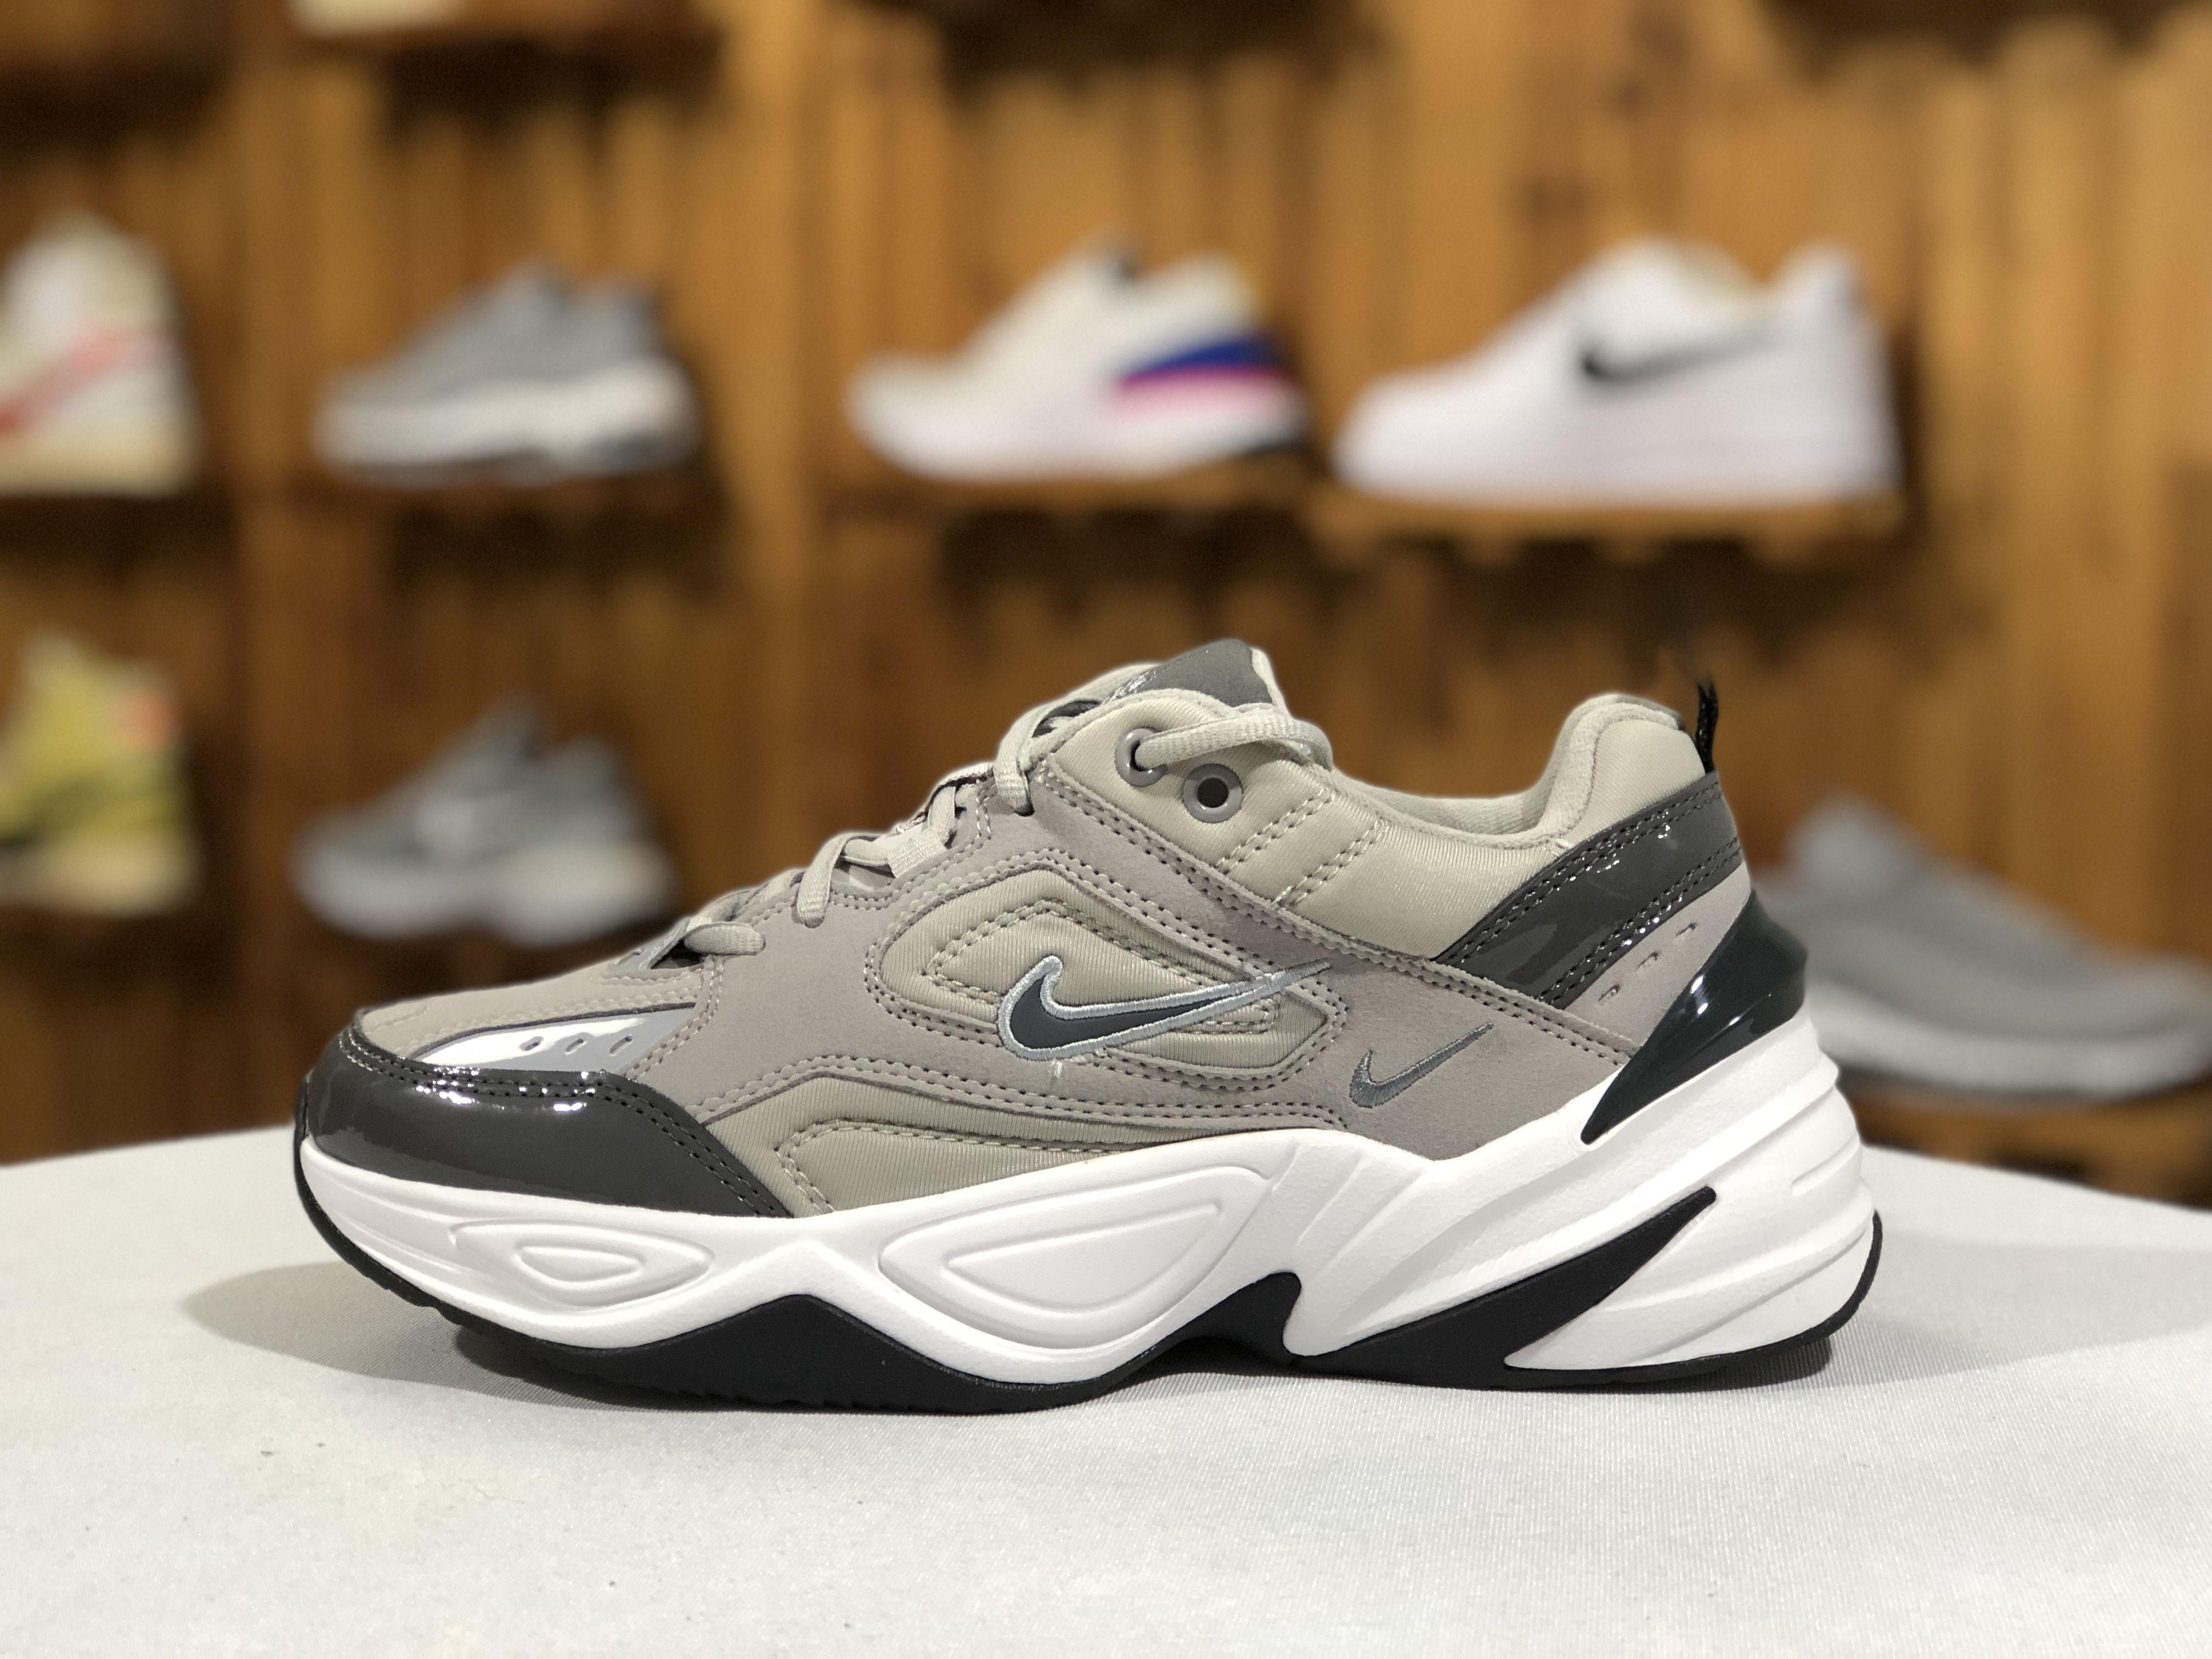 Nike M2k Tekno Rich Clash Grey Atmosphere Black White For Sale Nike Air Max 97 Mens Nike Air Nike Men